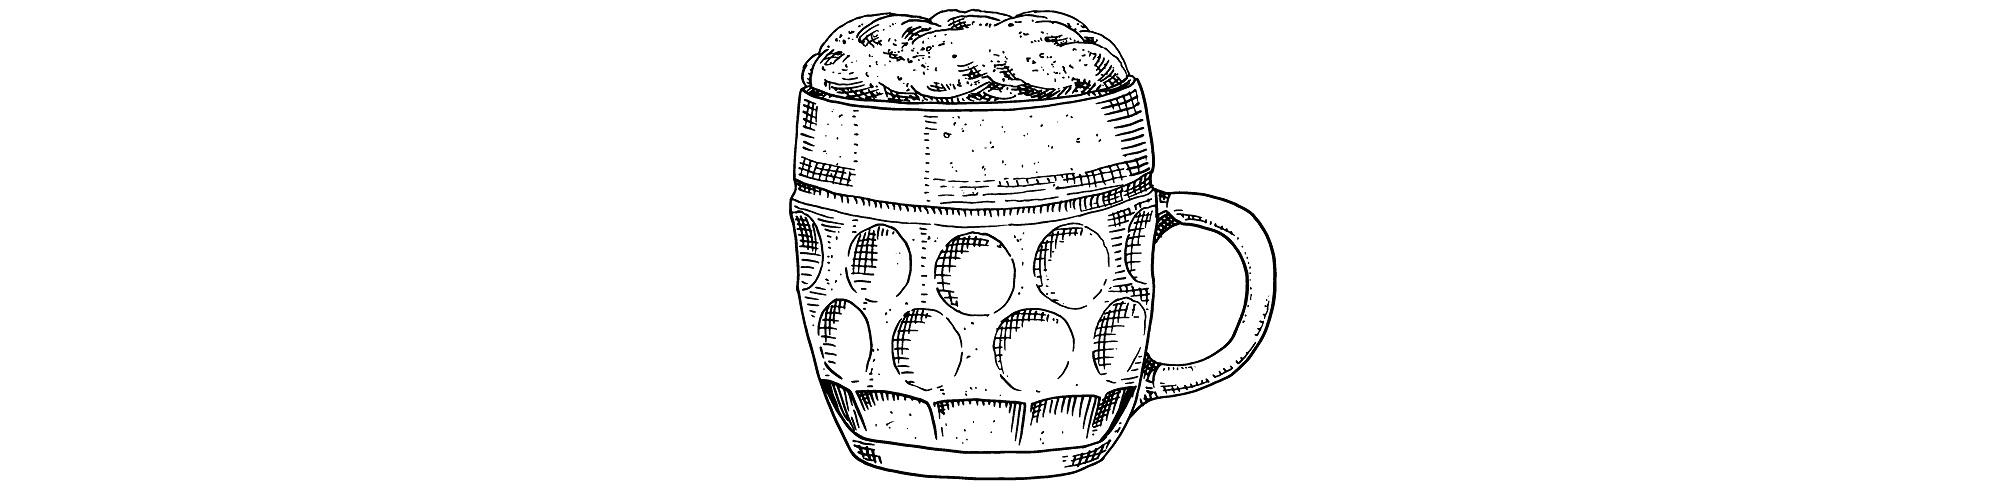 pint glass illustration